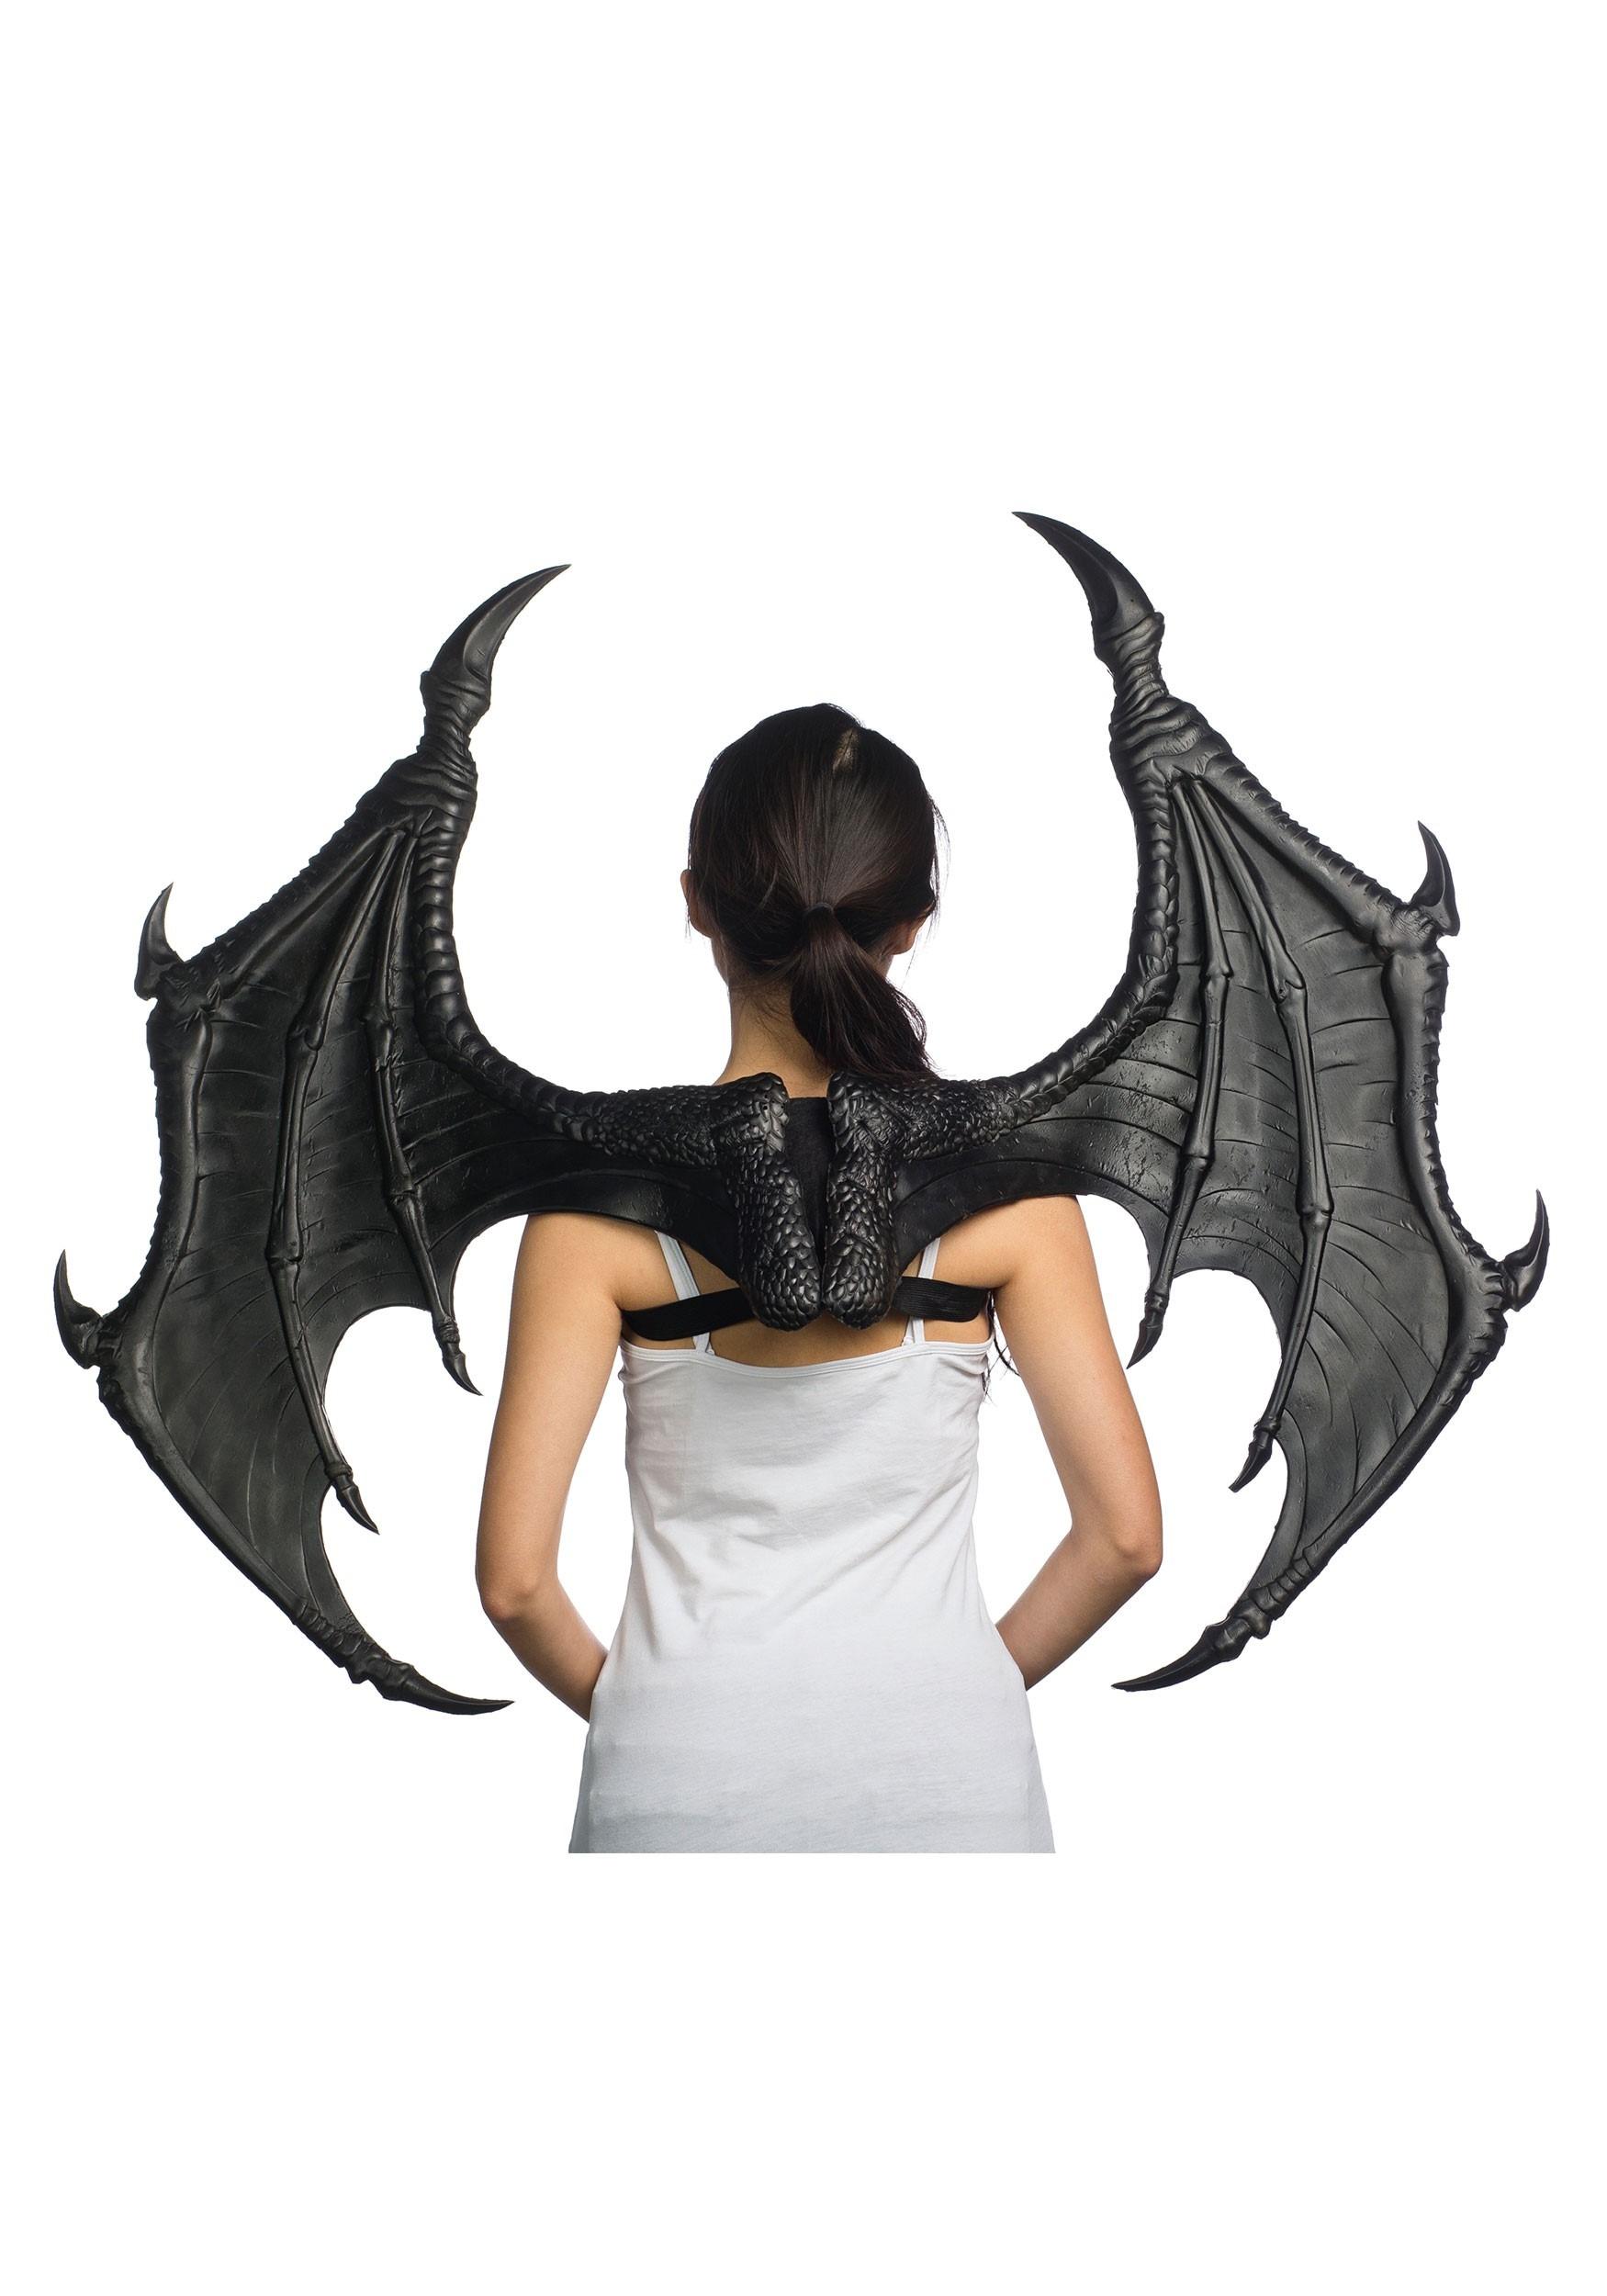 Ultimate Shiny Black Dragon Wings